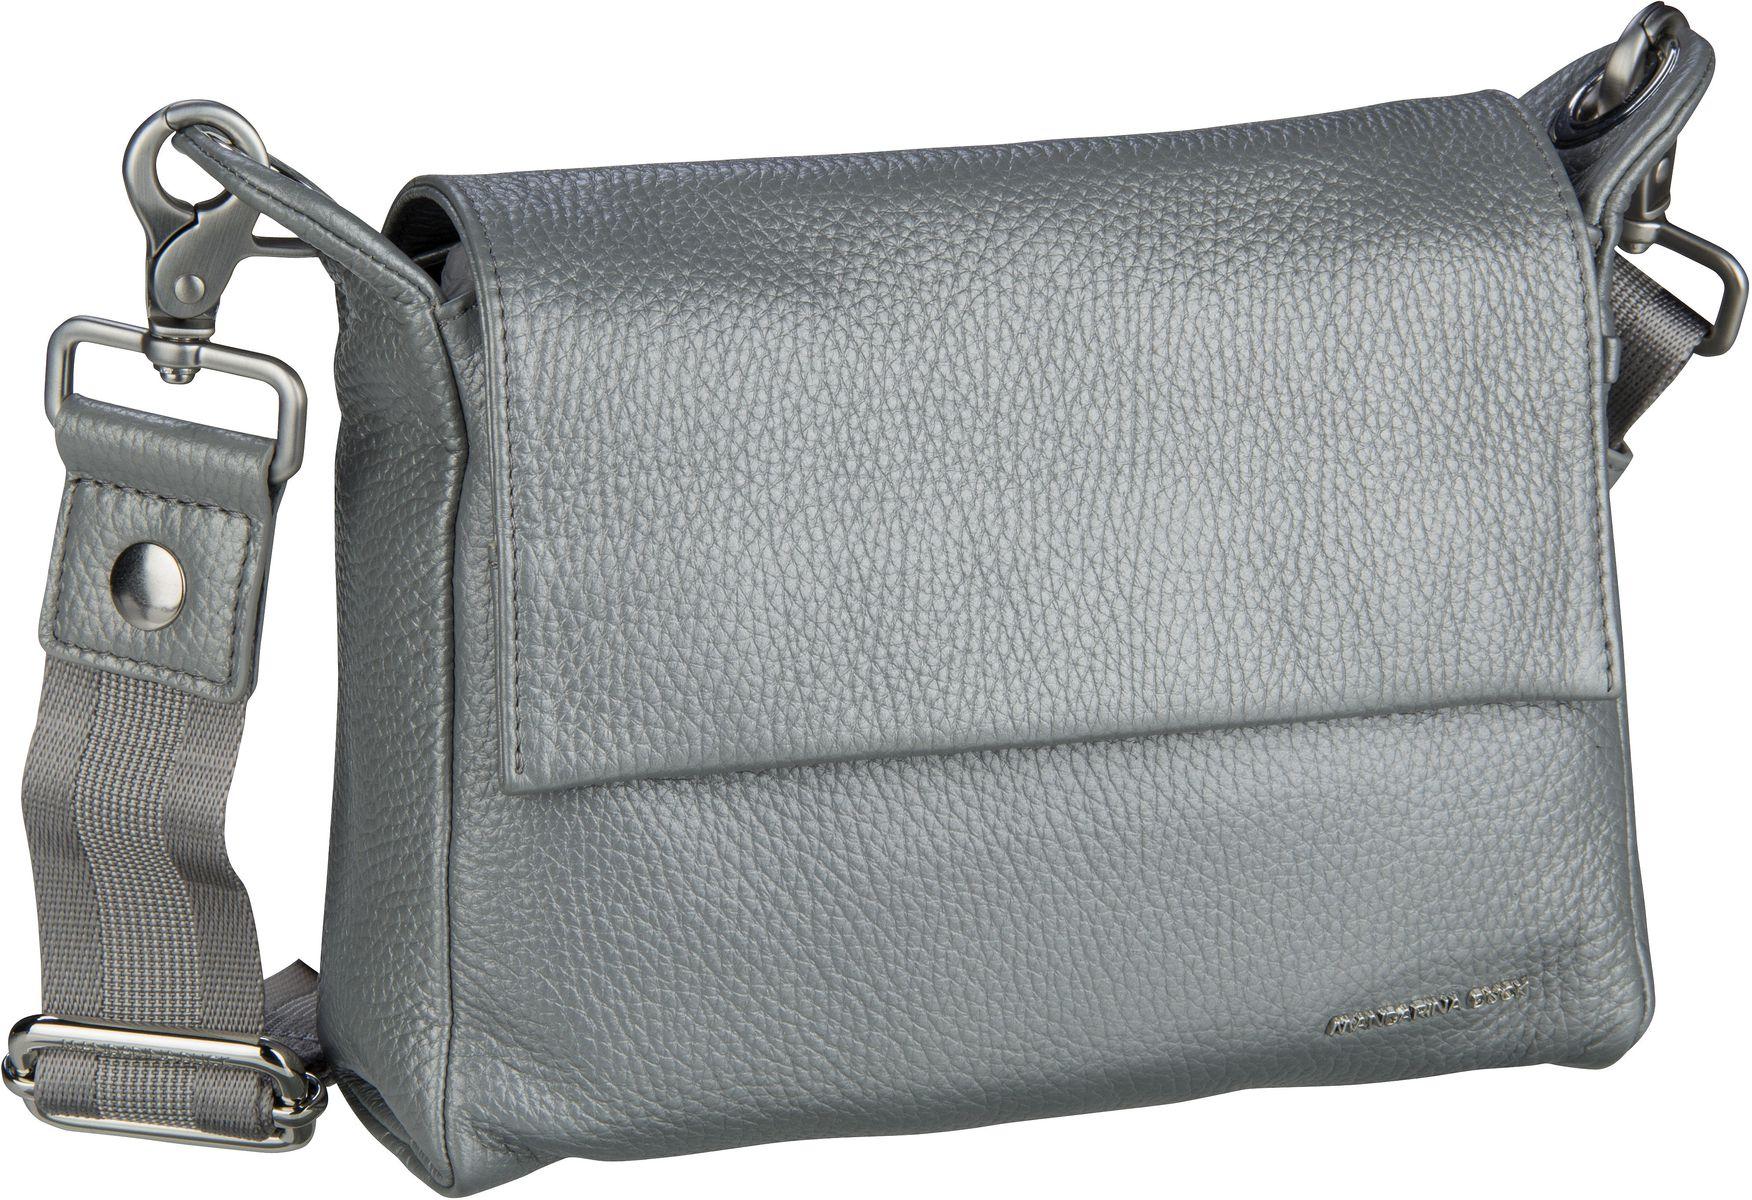 Umhängetasche Mellow Leather Lux Crossover ZLT93 Silver